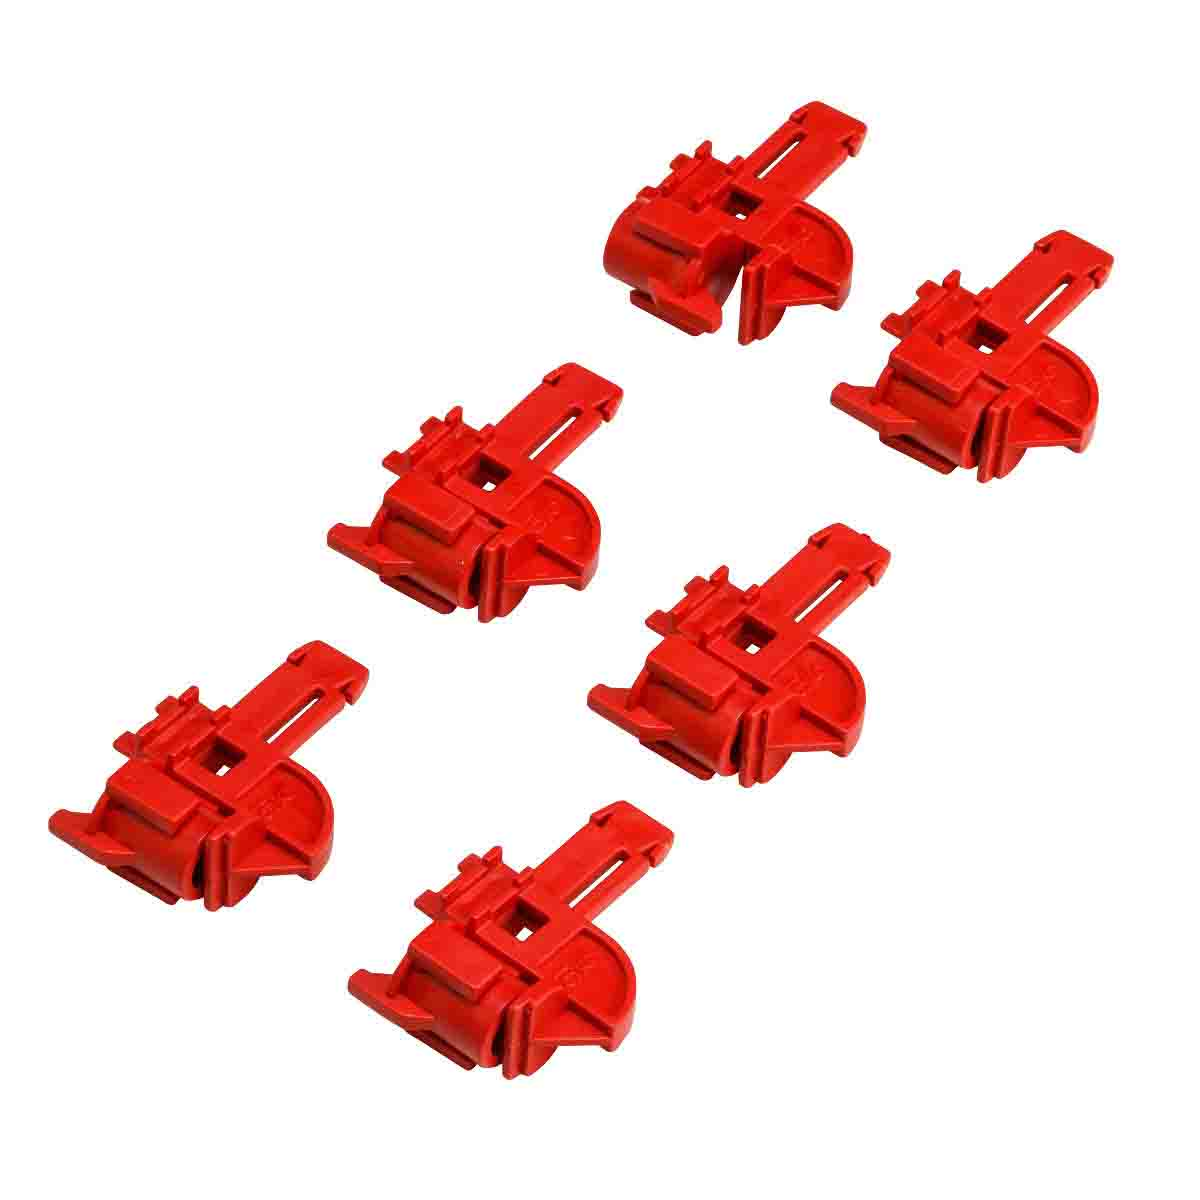 dy Part: 65751 | Fuse Lockout Devices | dyID.com on panel lockout, transformer lockout, electrical plug lockout, switch lockout, hose bibb lockout,